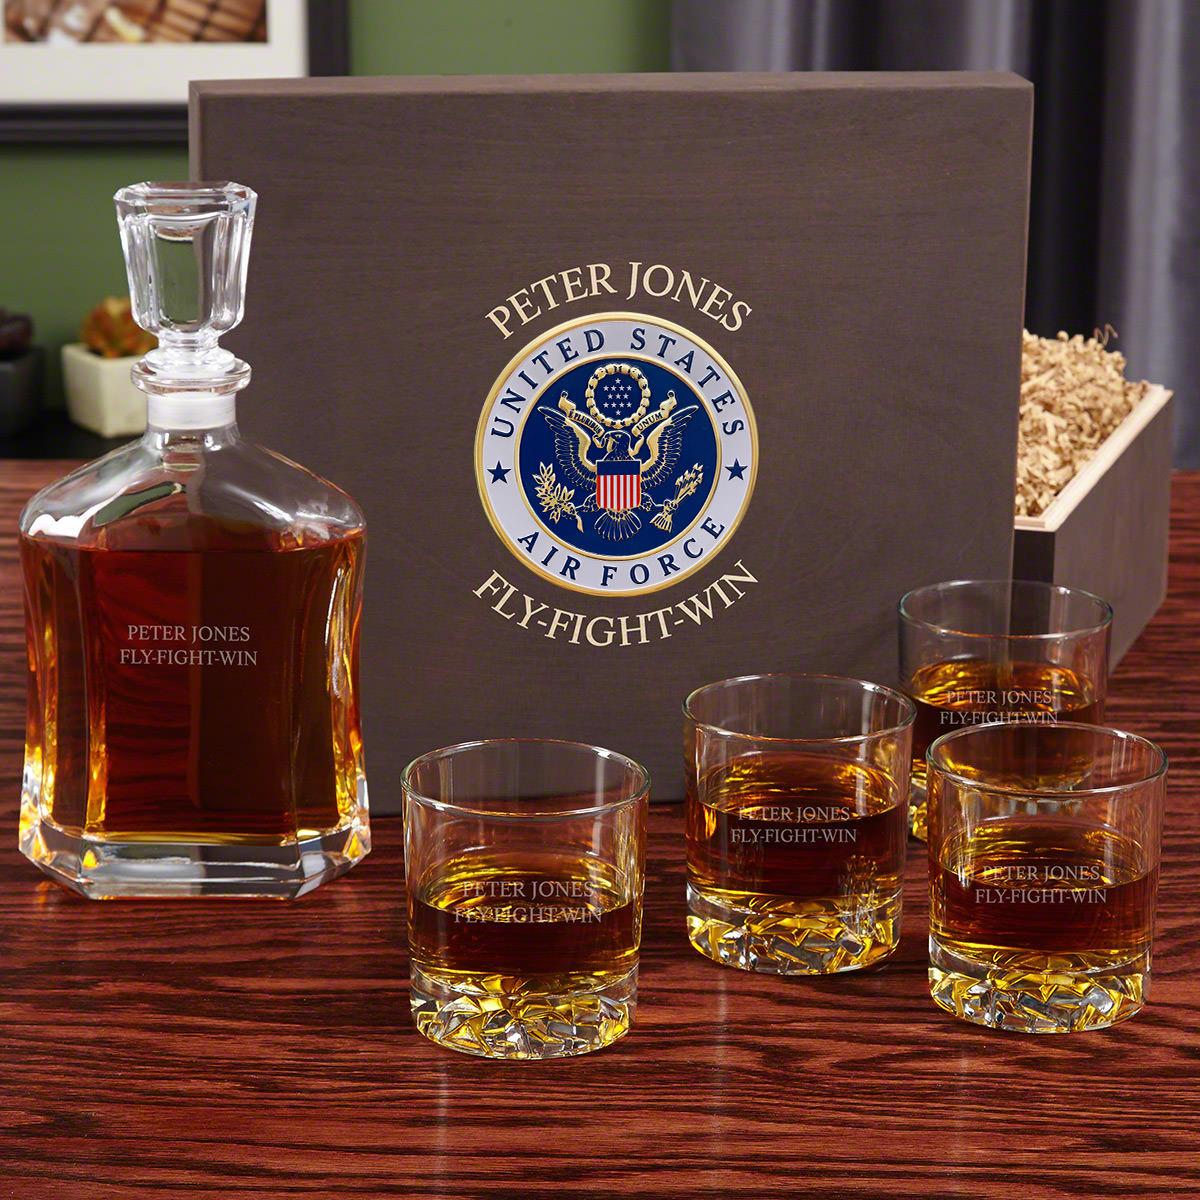 Custom Argos Whiskey Decanter Set Air Force Retirement Gifts